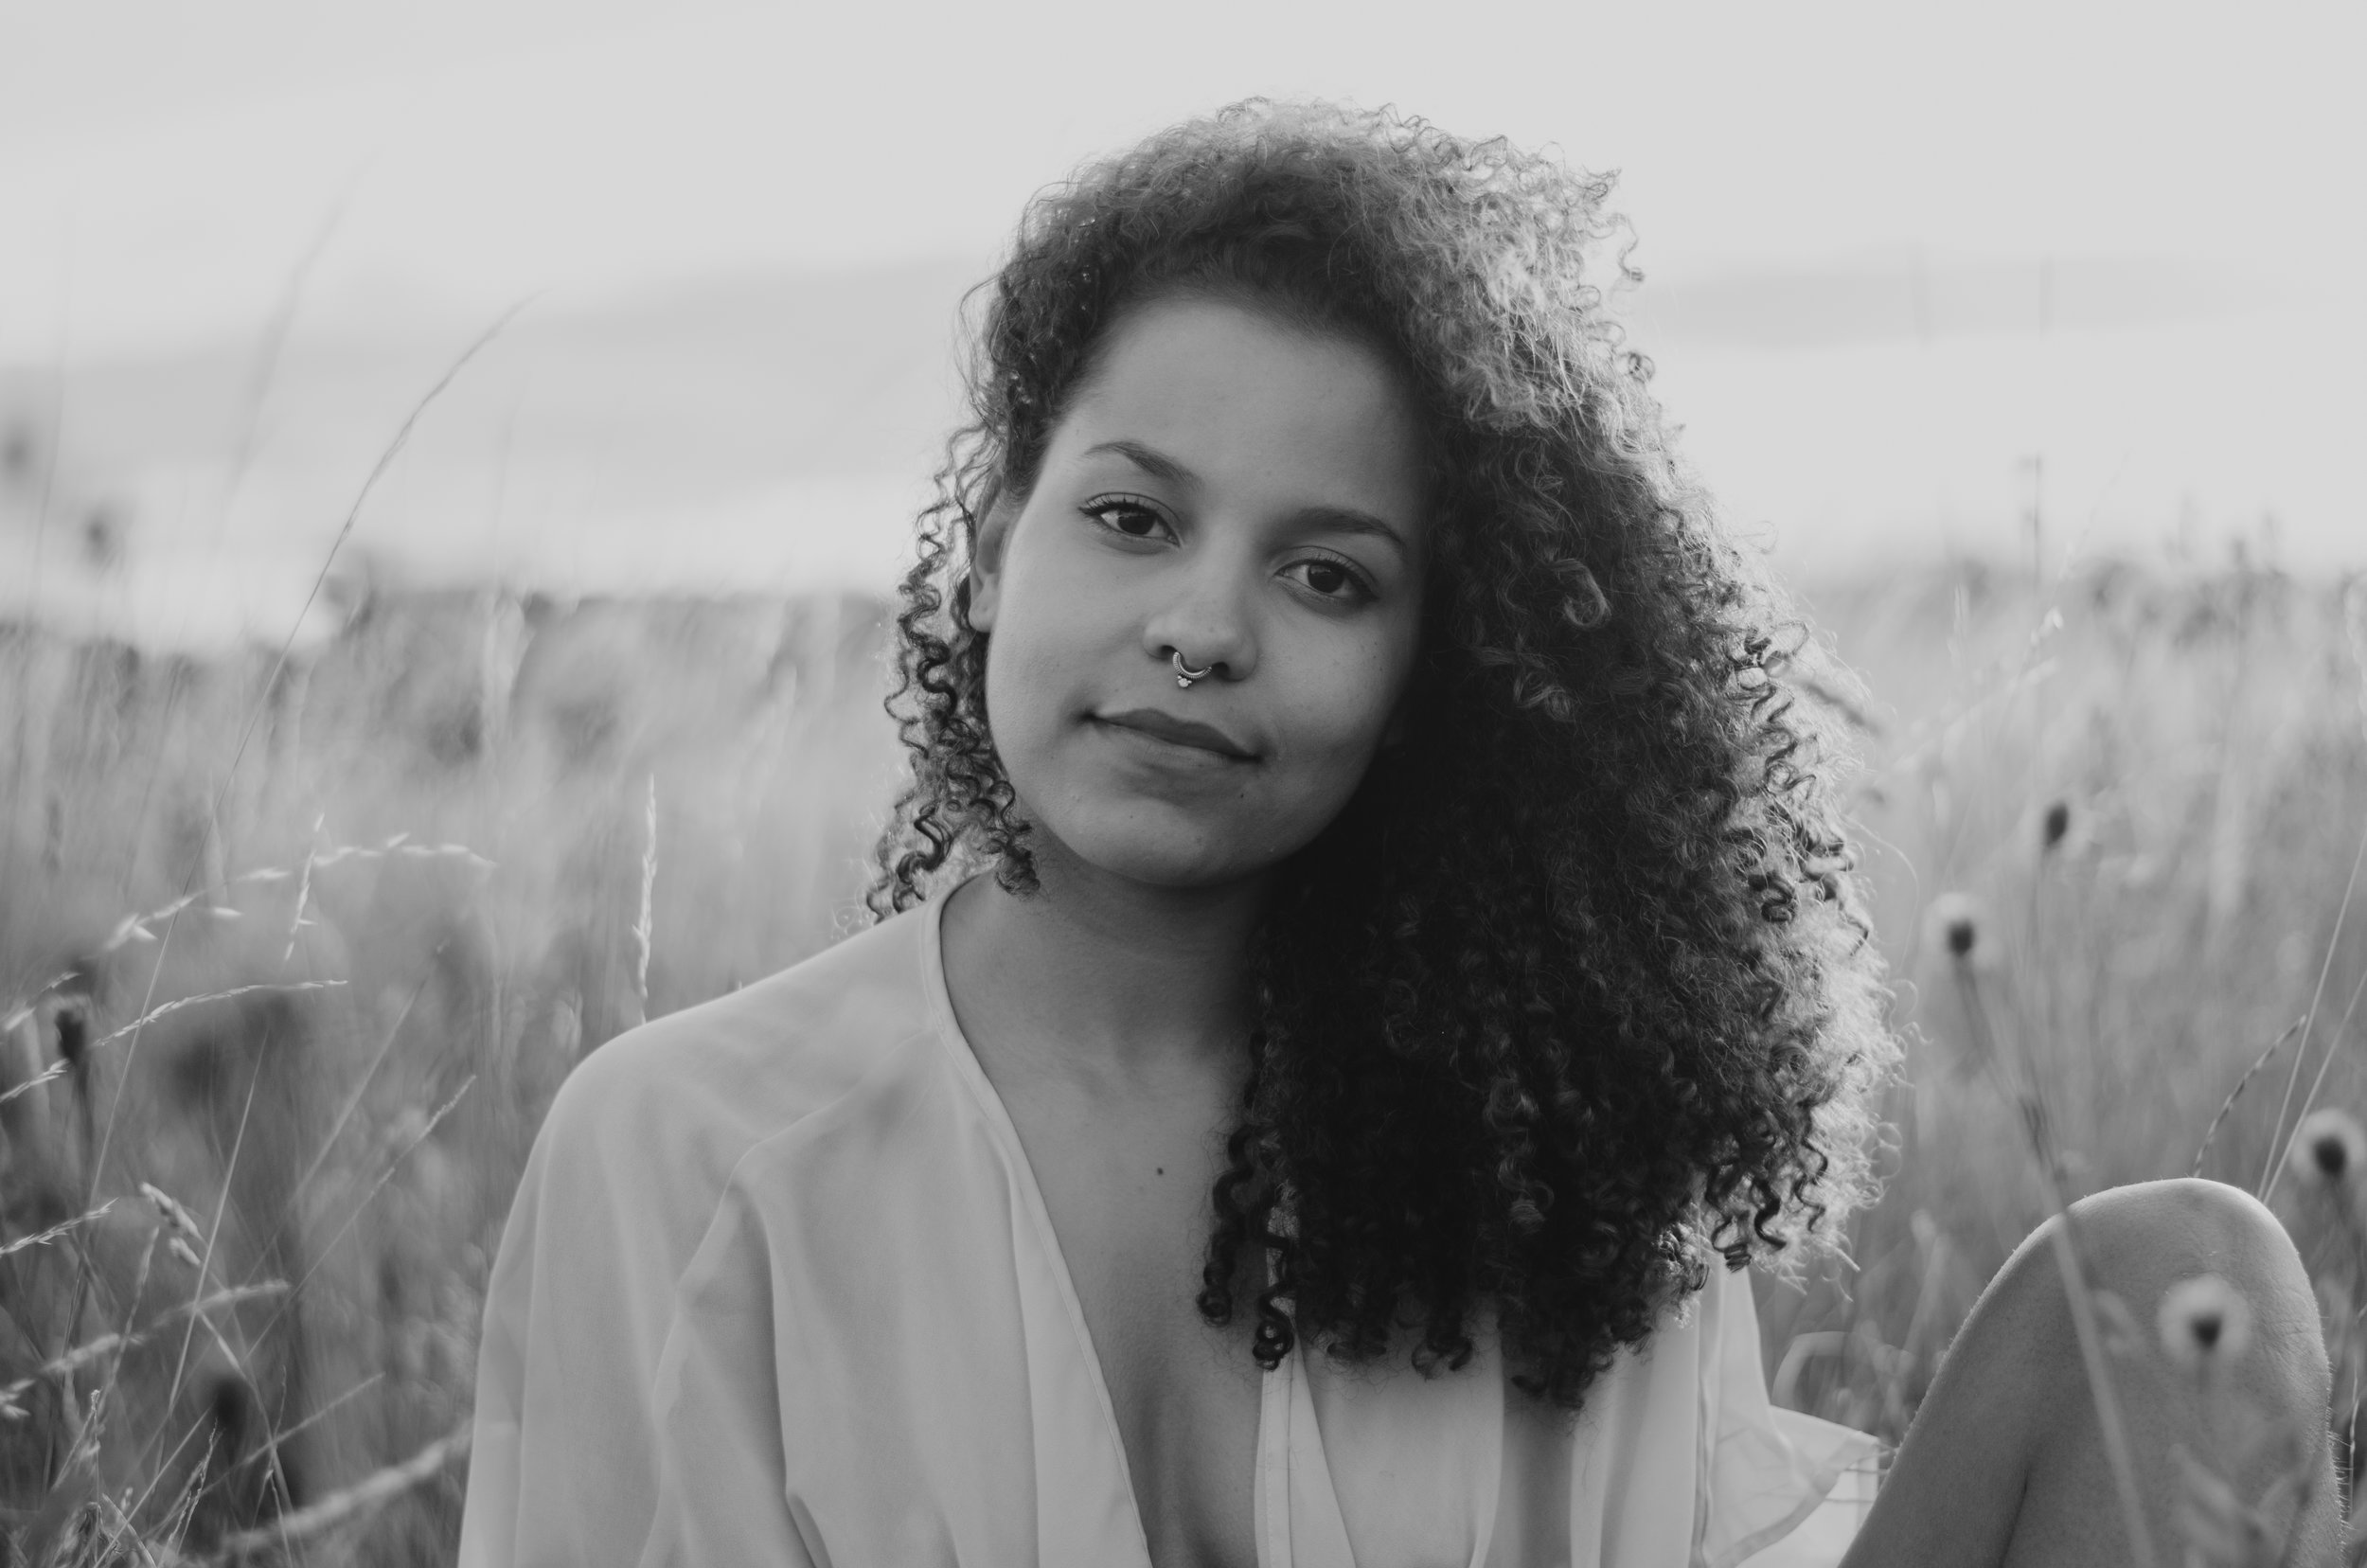 Inka-Portrait-Session-Aiste-Saulyte-Photography-17-07-30-361.jpg